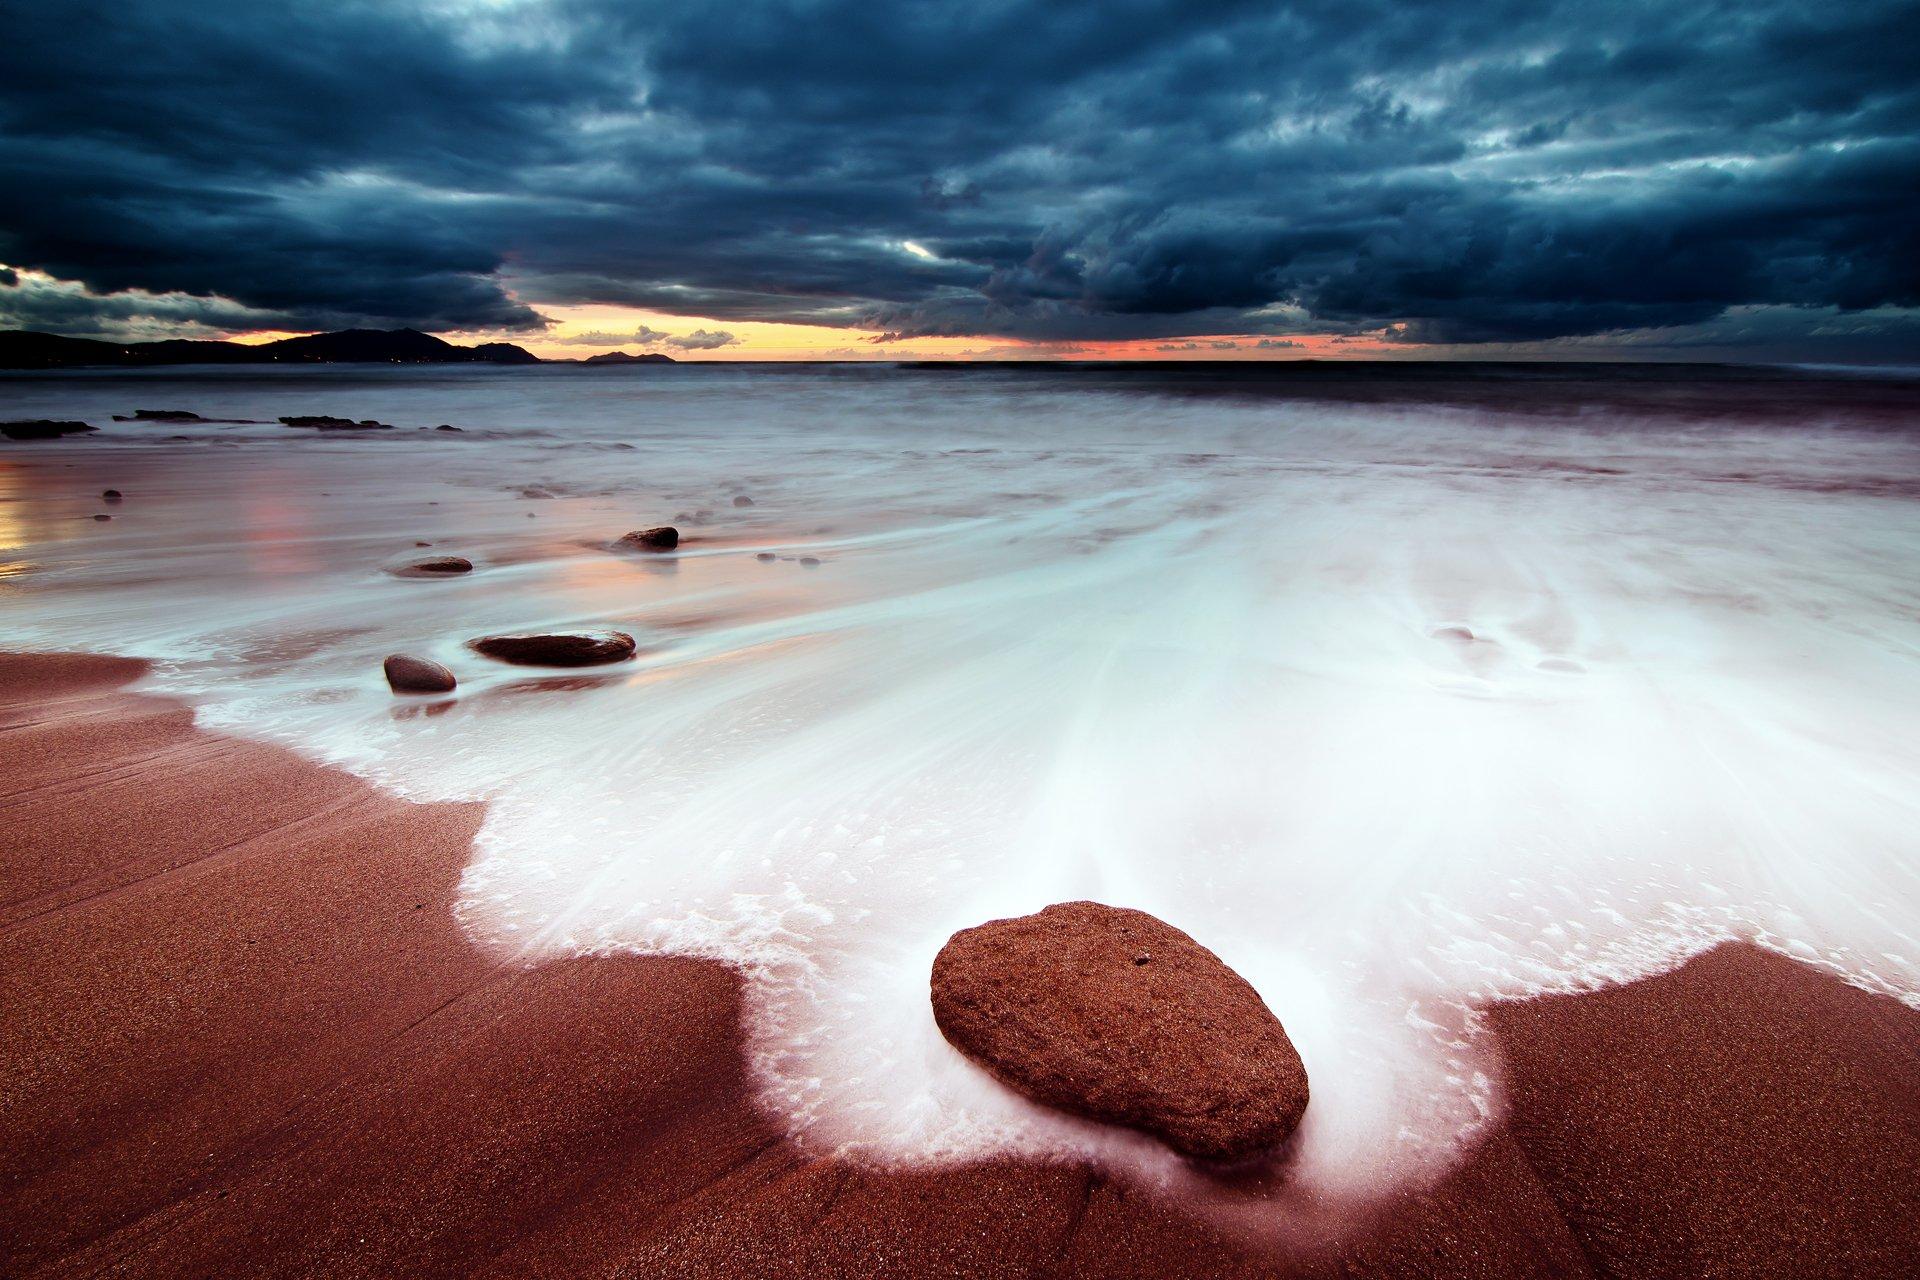 песок на берегу моря картинки снимки создают вдохновляющую